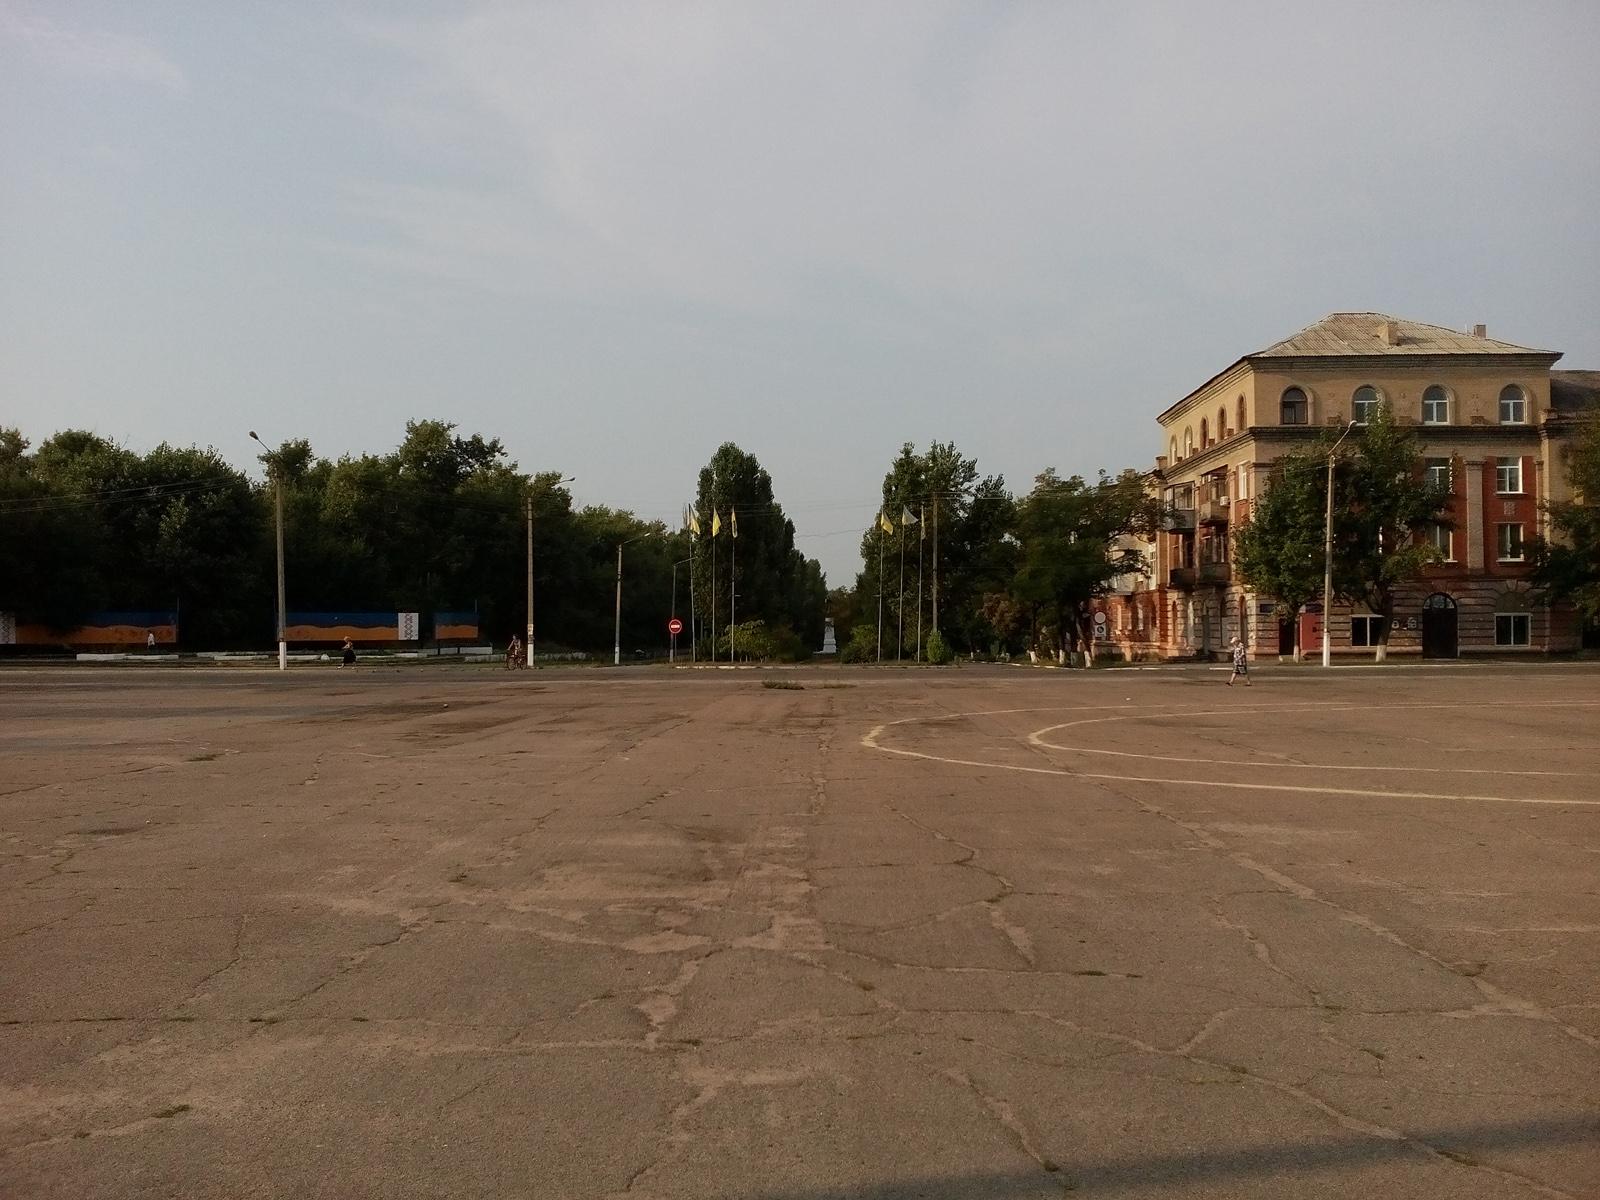 Площадь и флаги